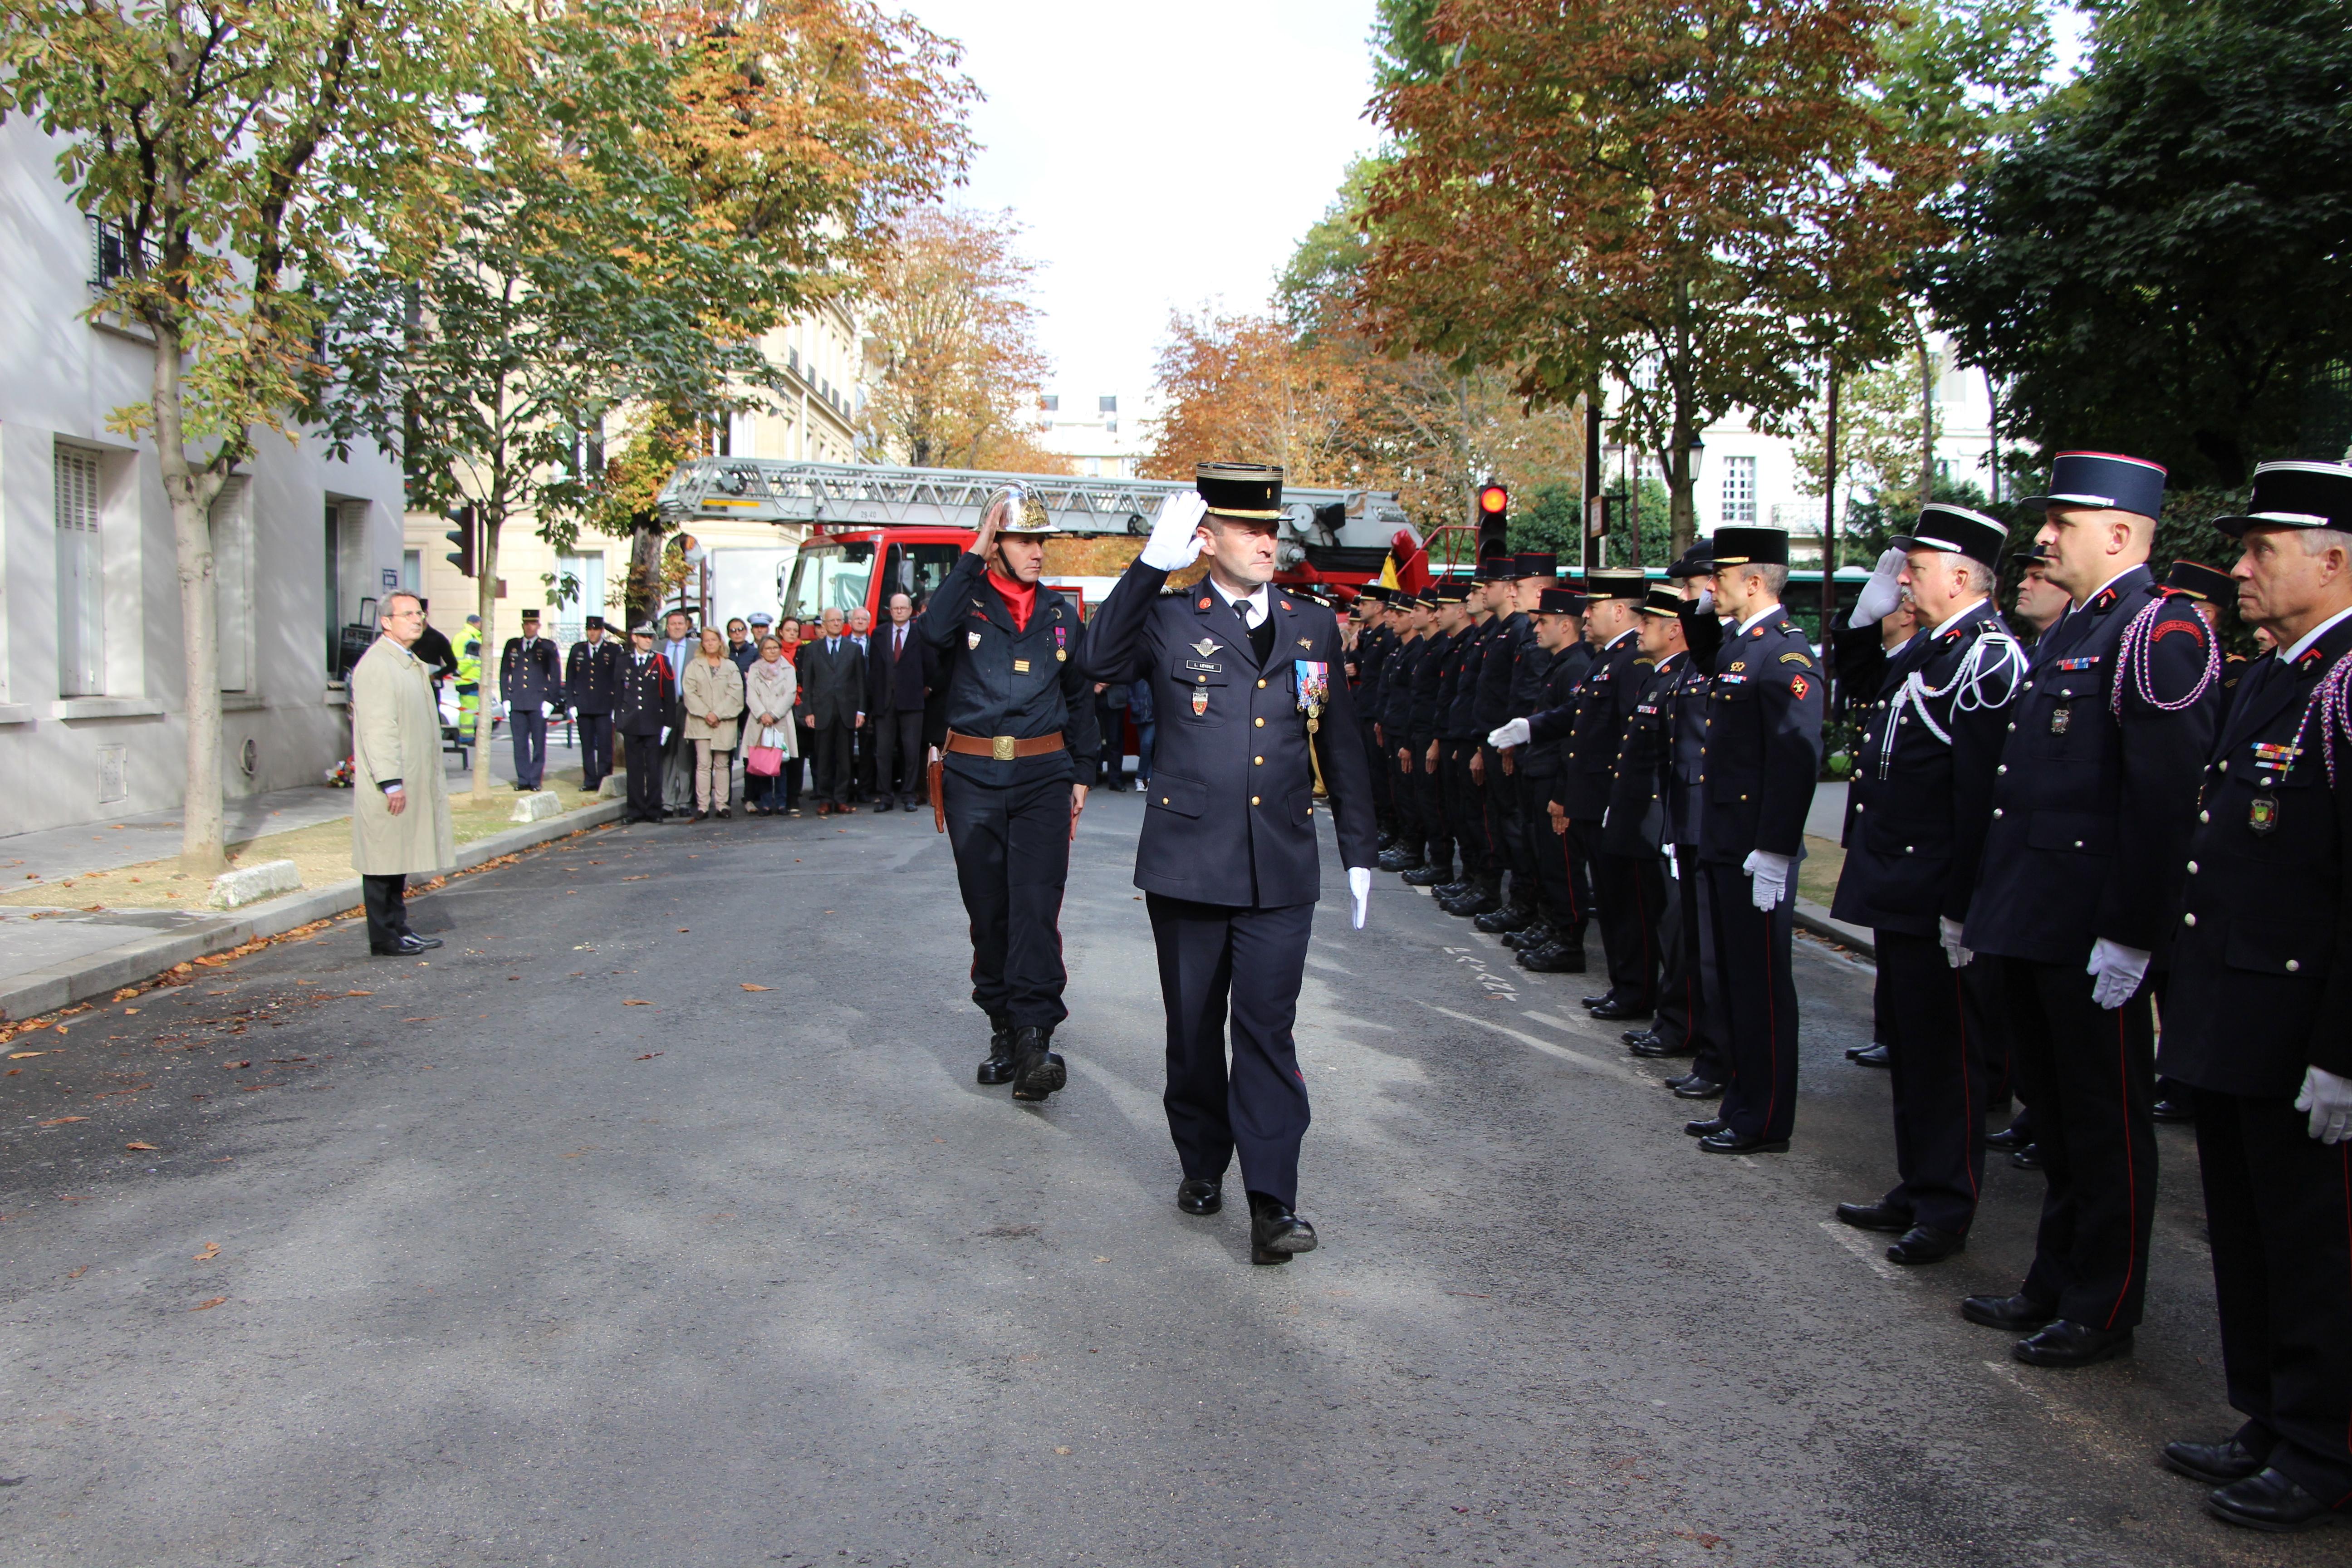 pompier ceremonie